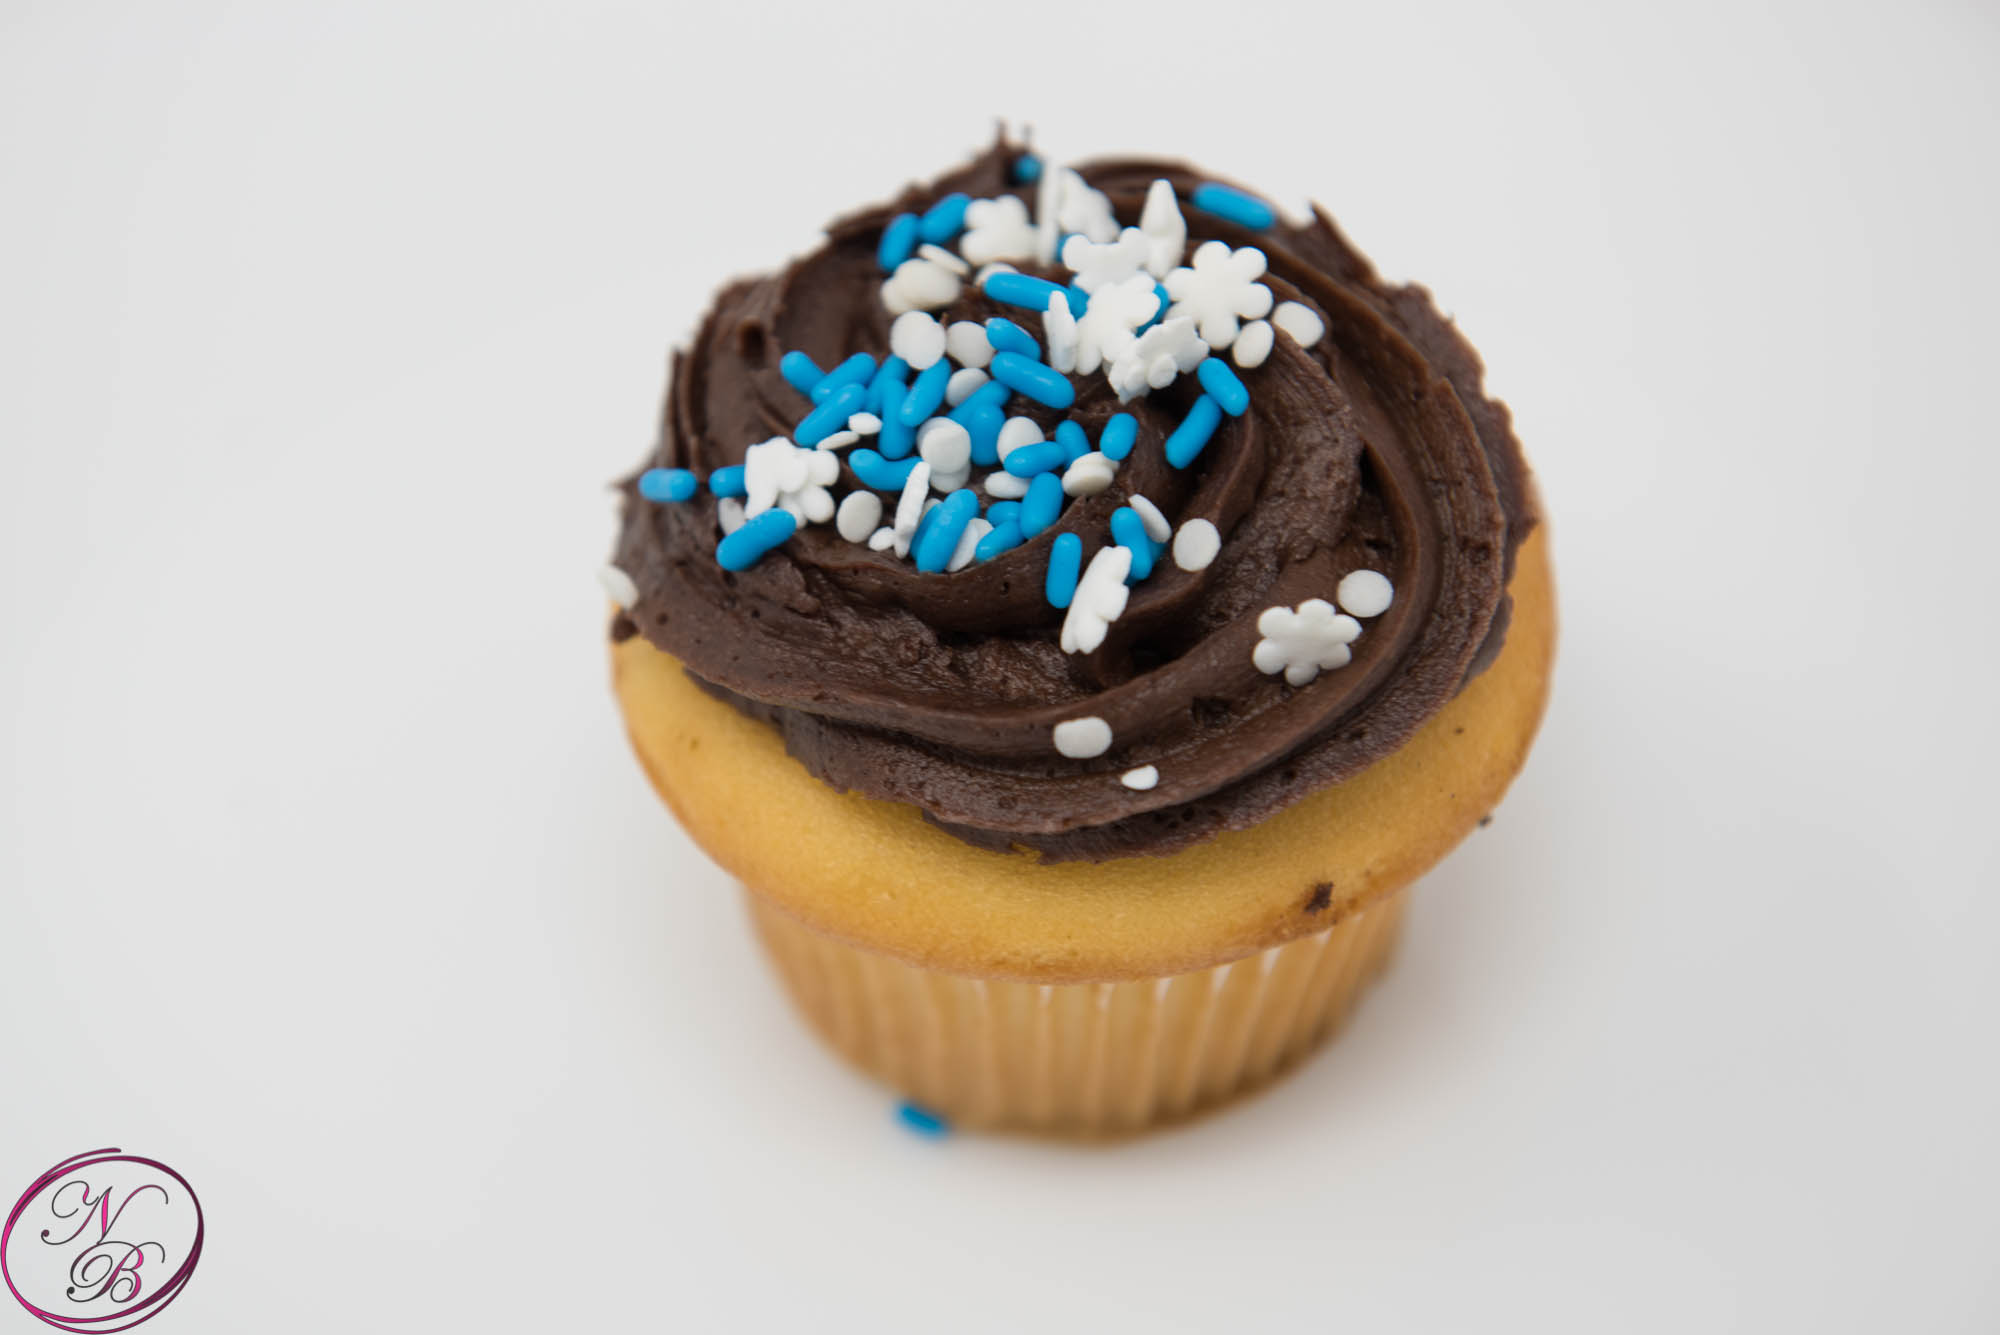 Vanilla W/ Chocolate Frosting Cupcake